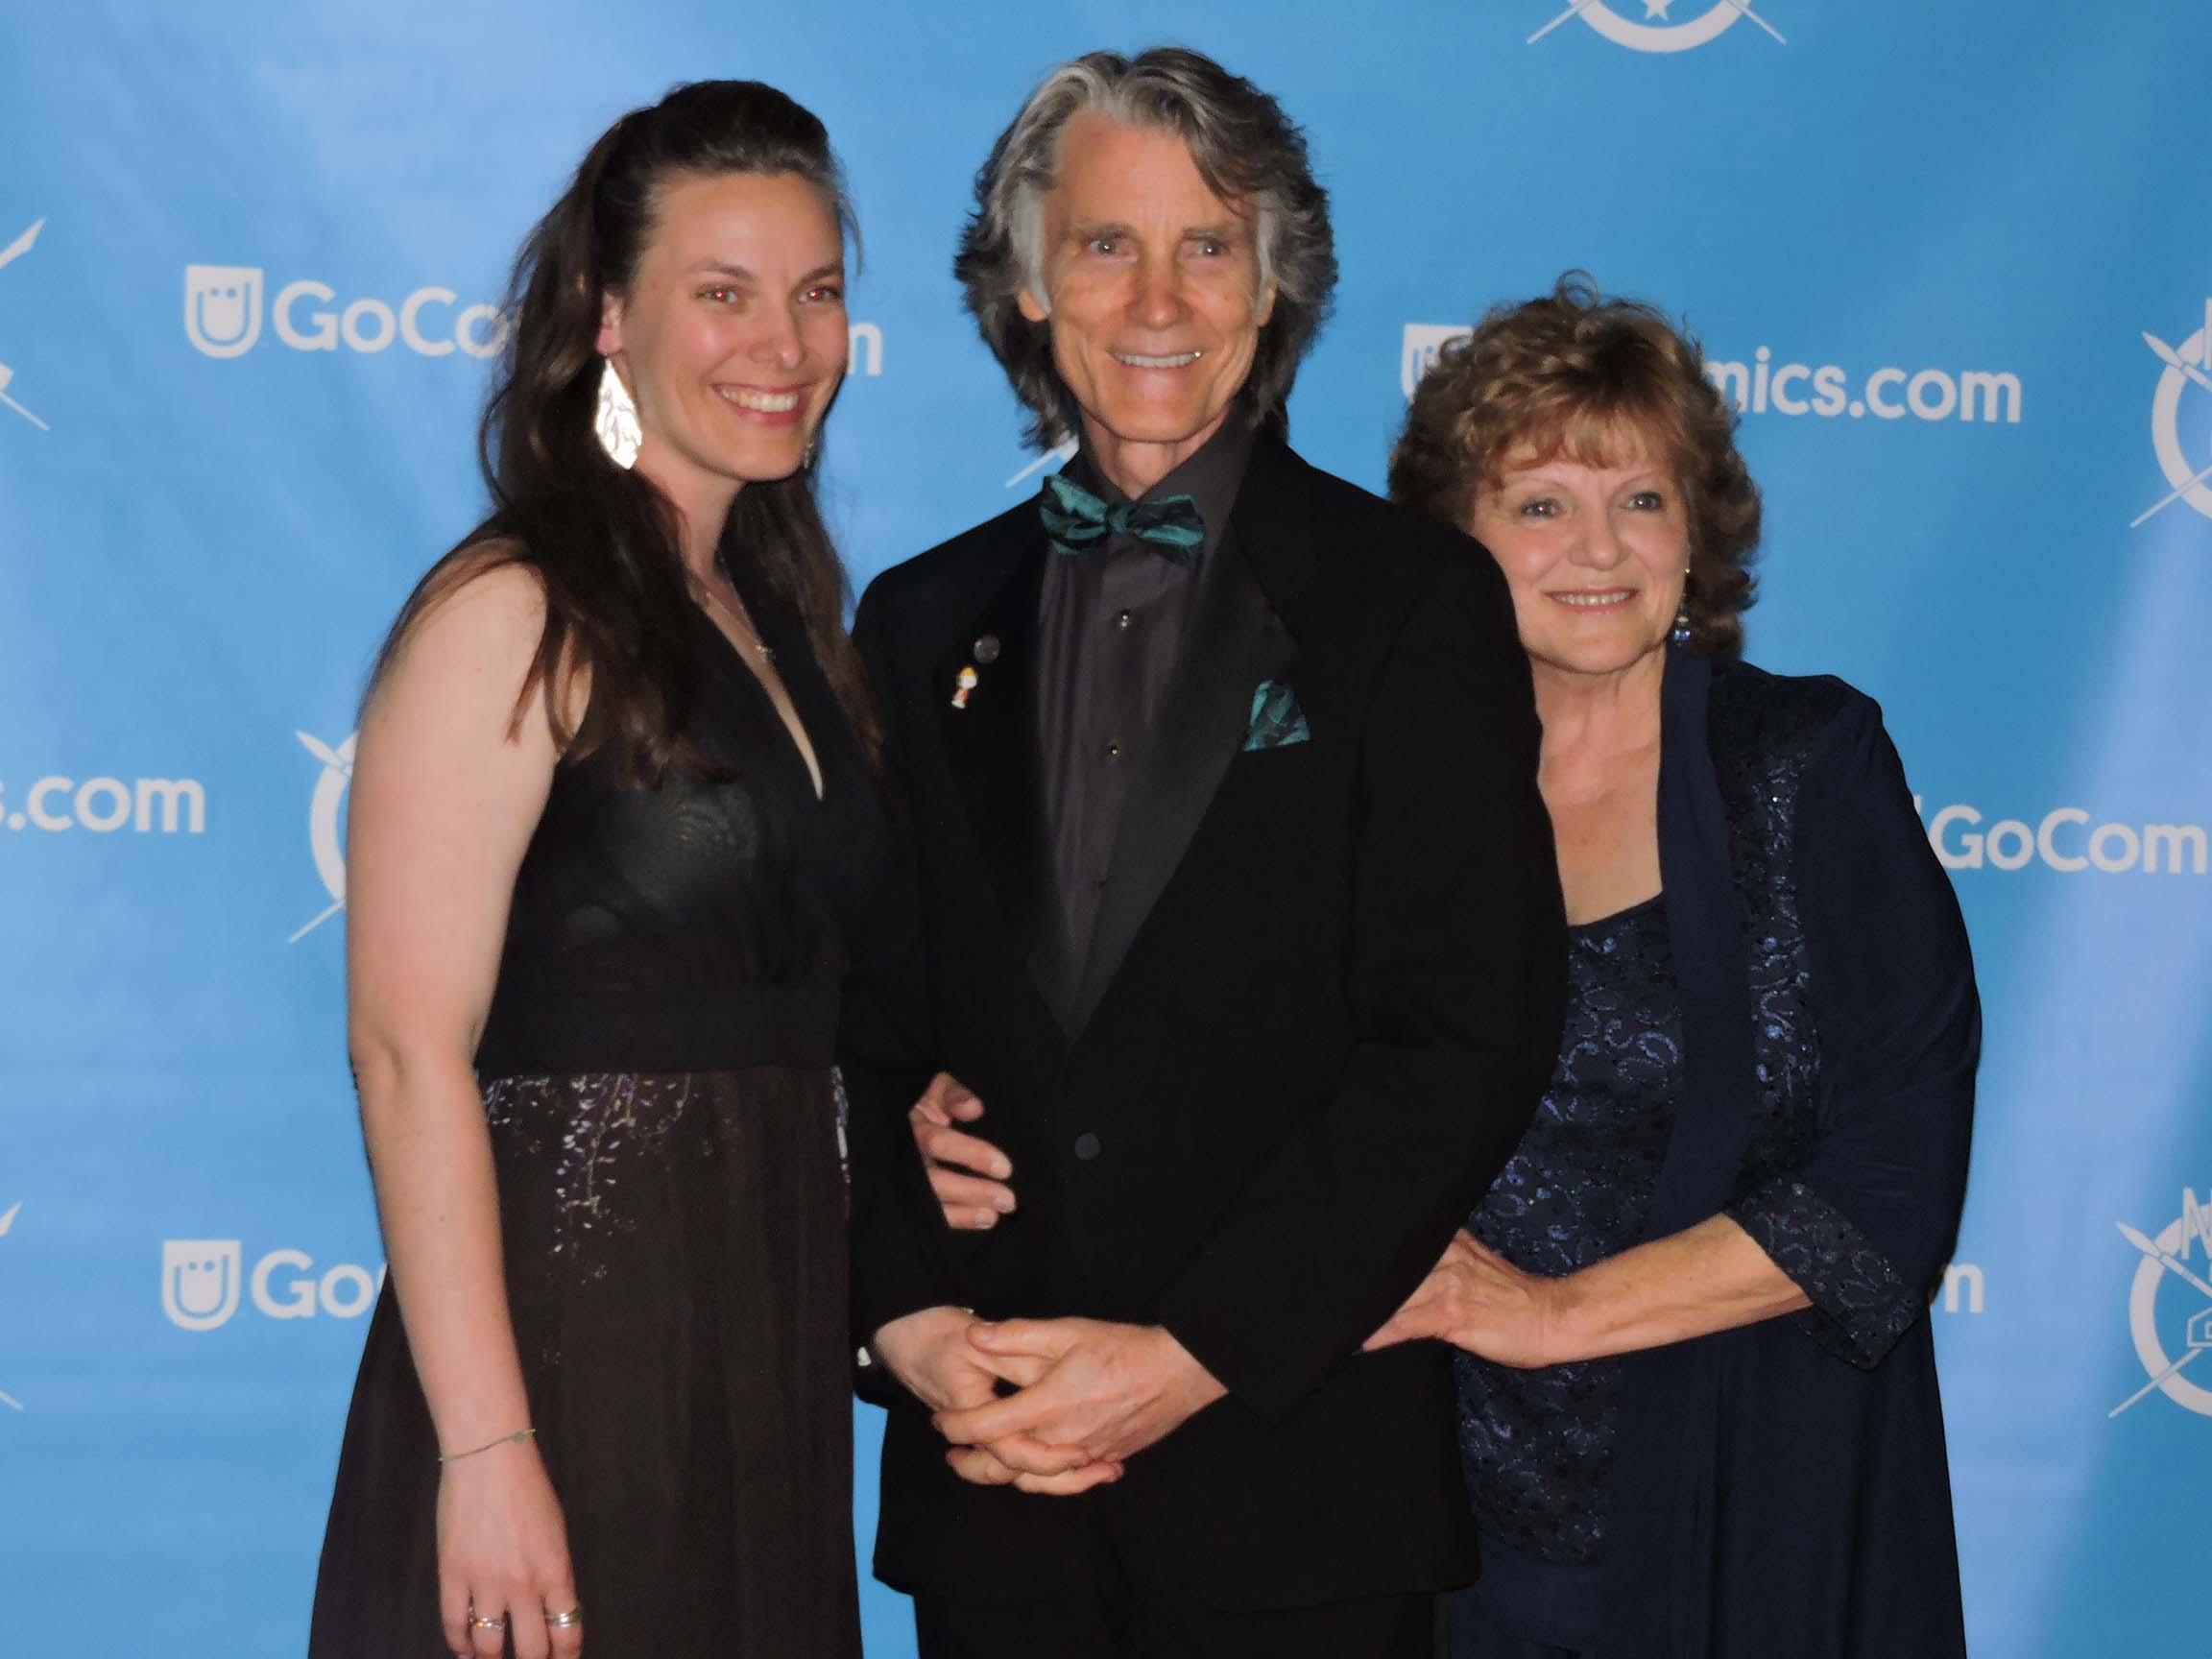 Karen, Greg and Betty Evans (l-r)